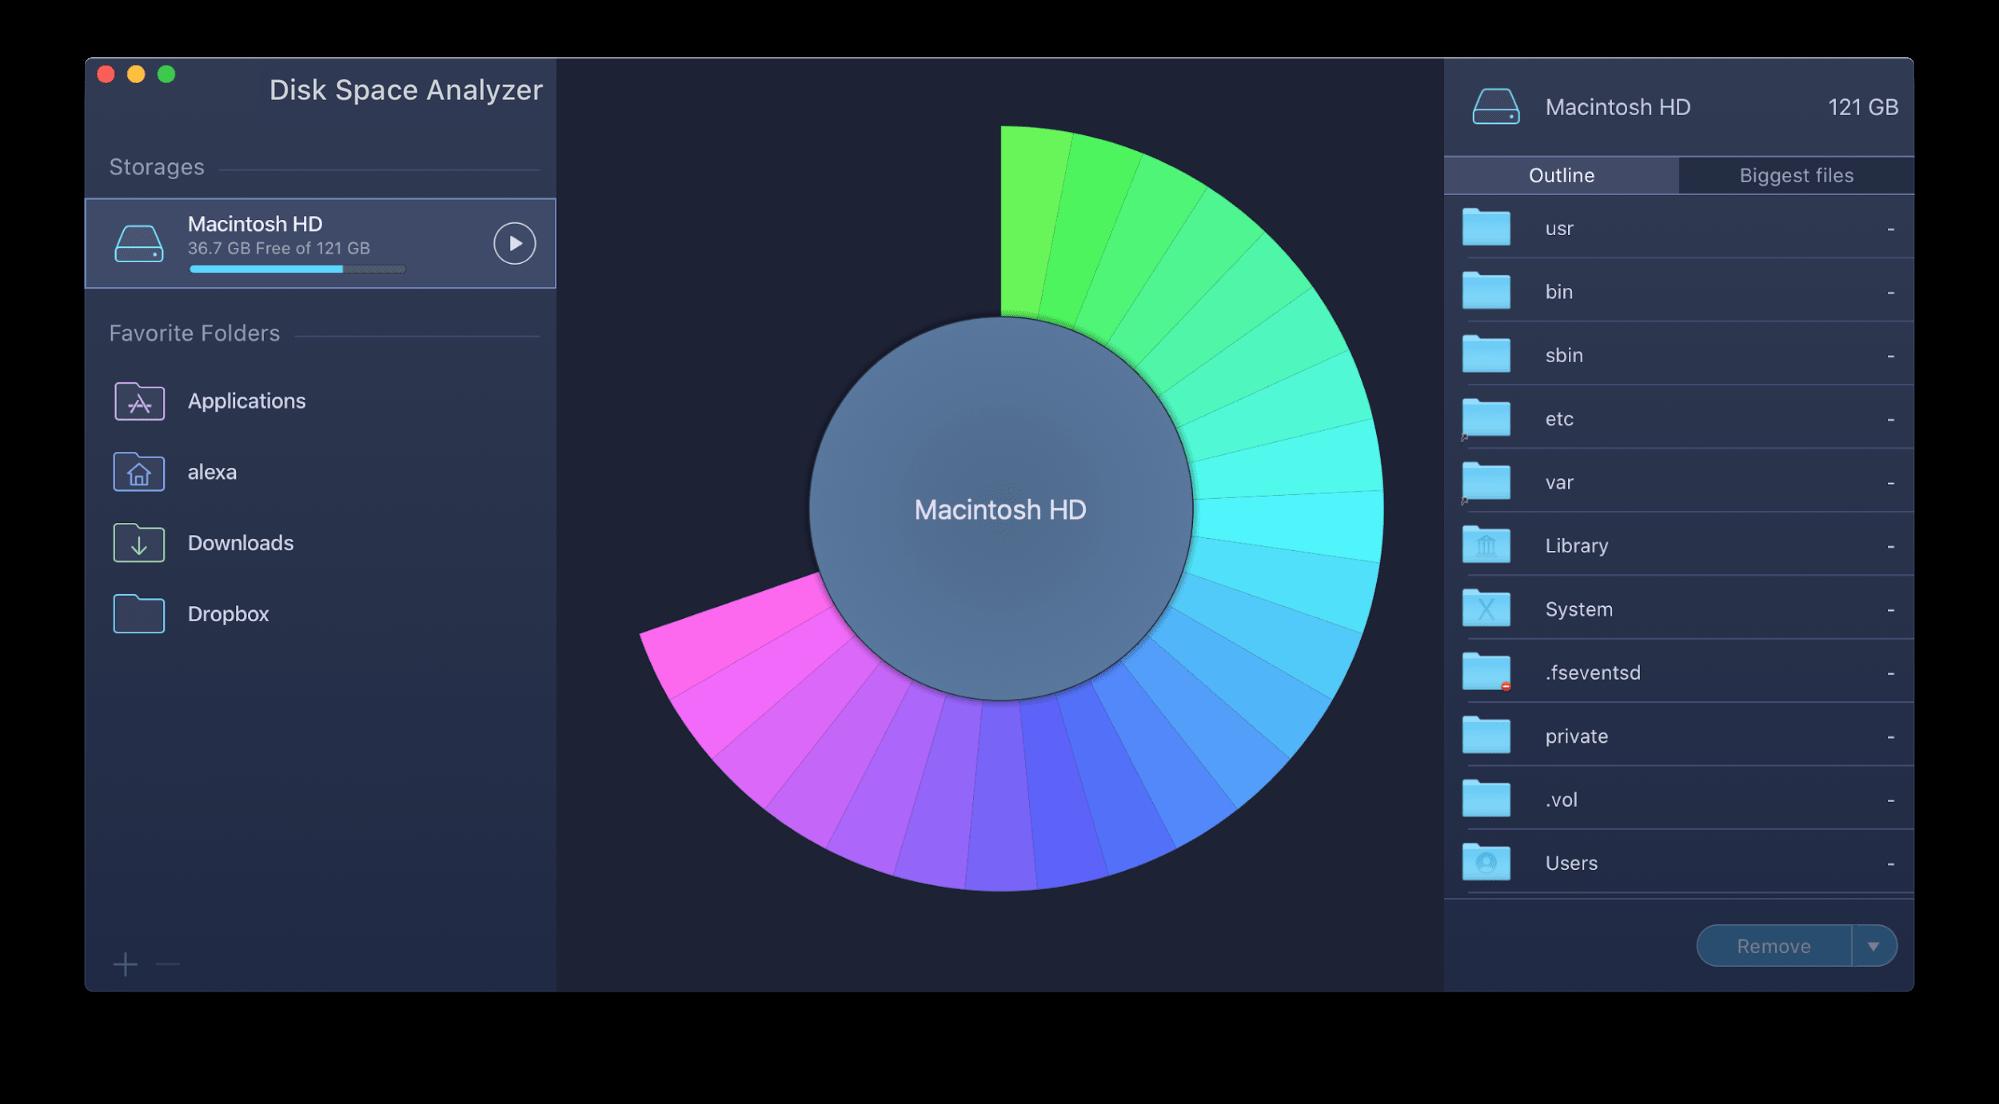 disk space analyzer app